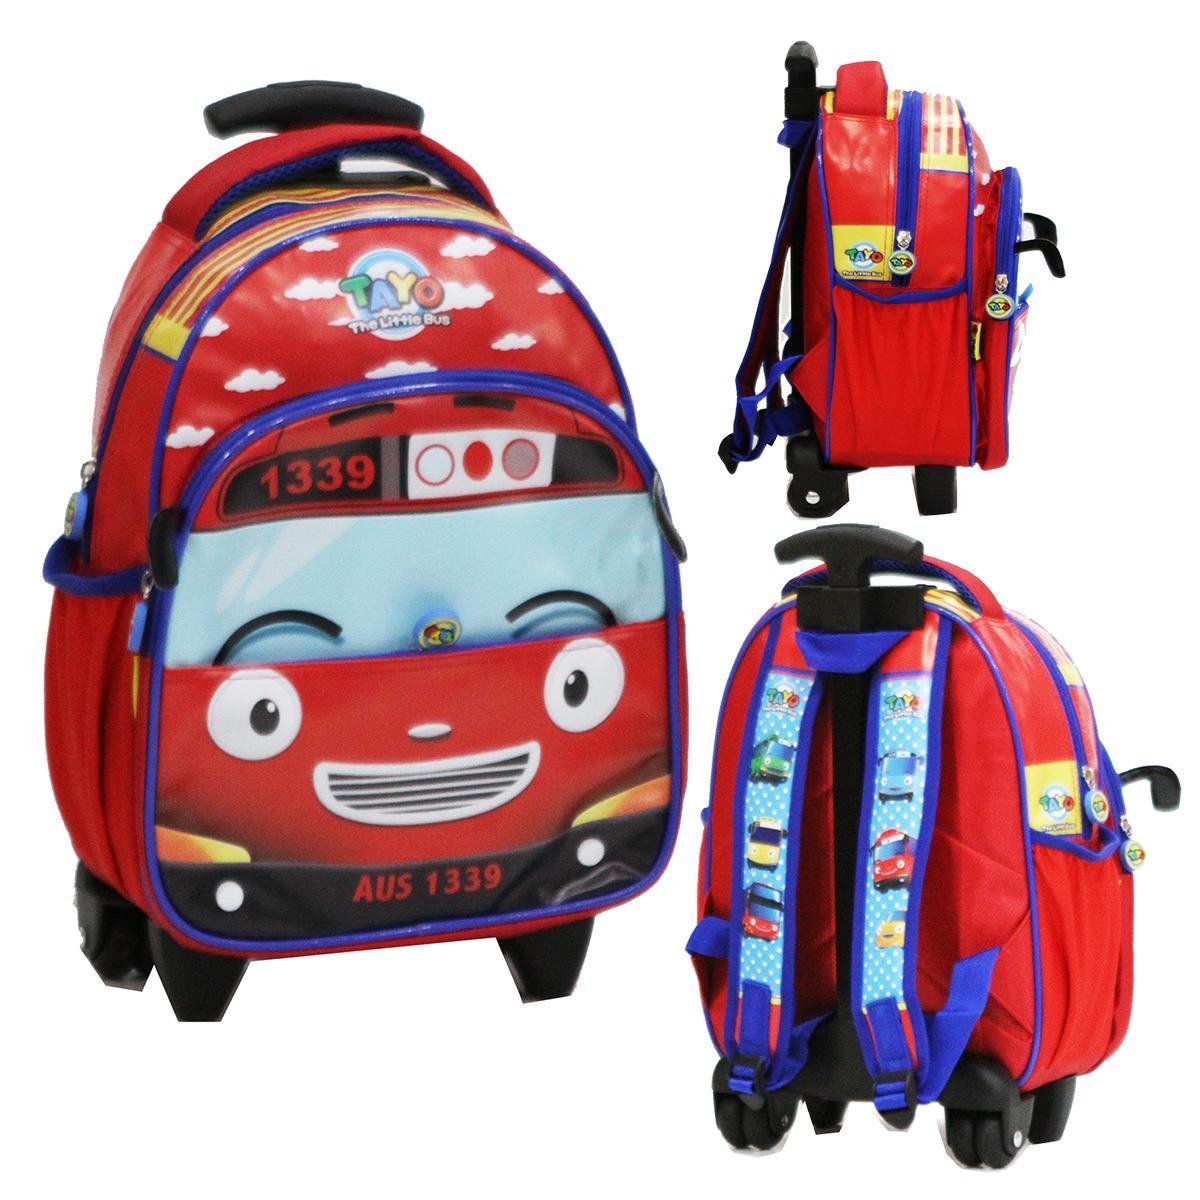 Top 10 Onlan Tas Trolley Anak Sekolah Tk Atau Play Group Motif Bus Tayo Bahan Kain Sponge Tahan Air 3Kt Online